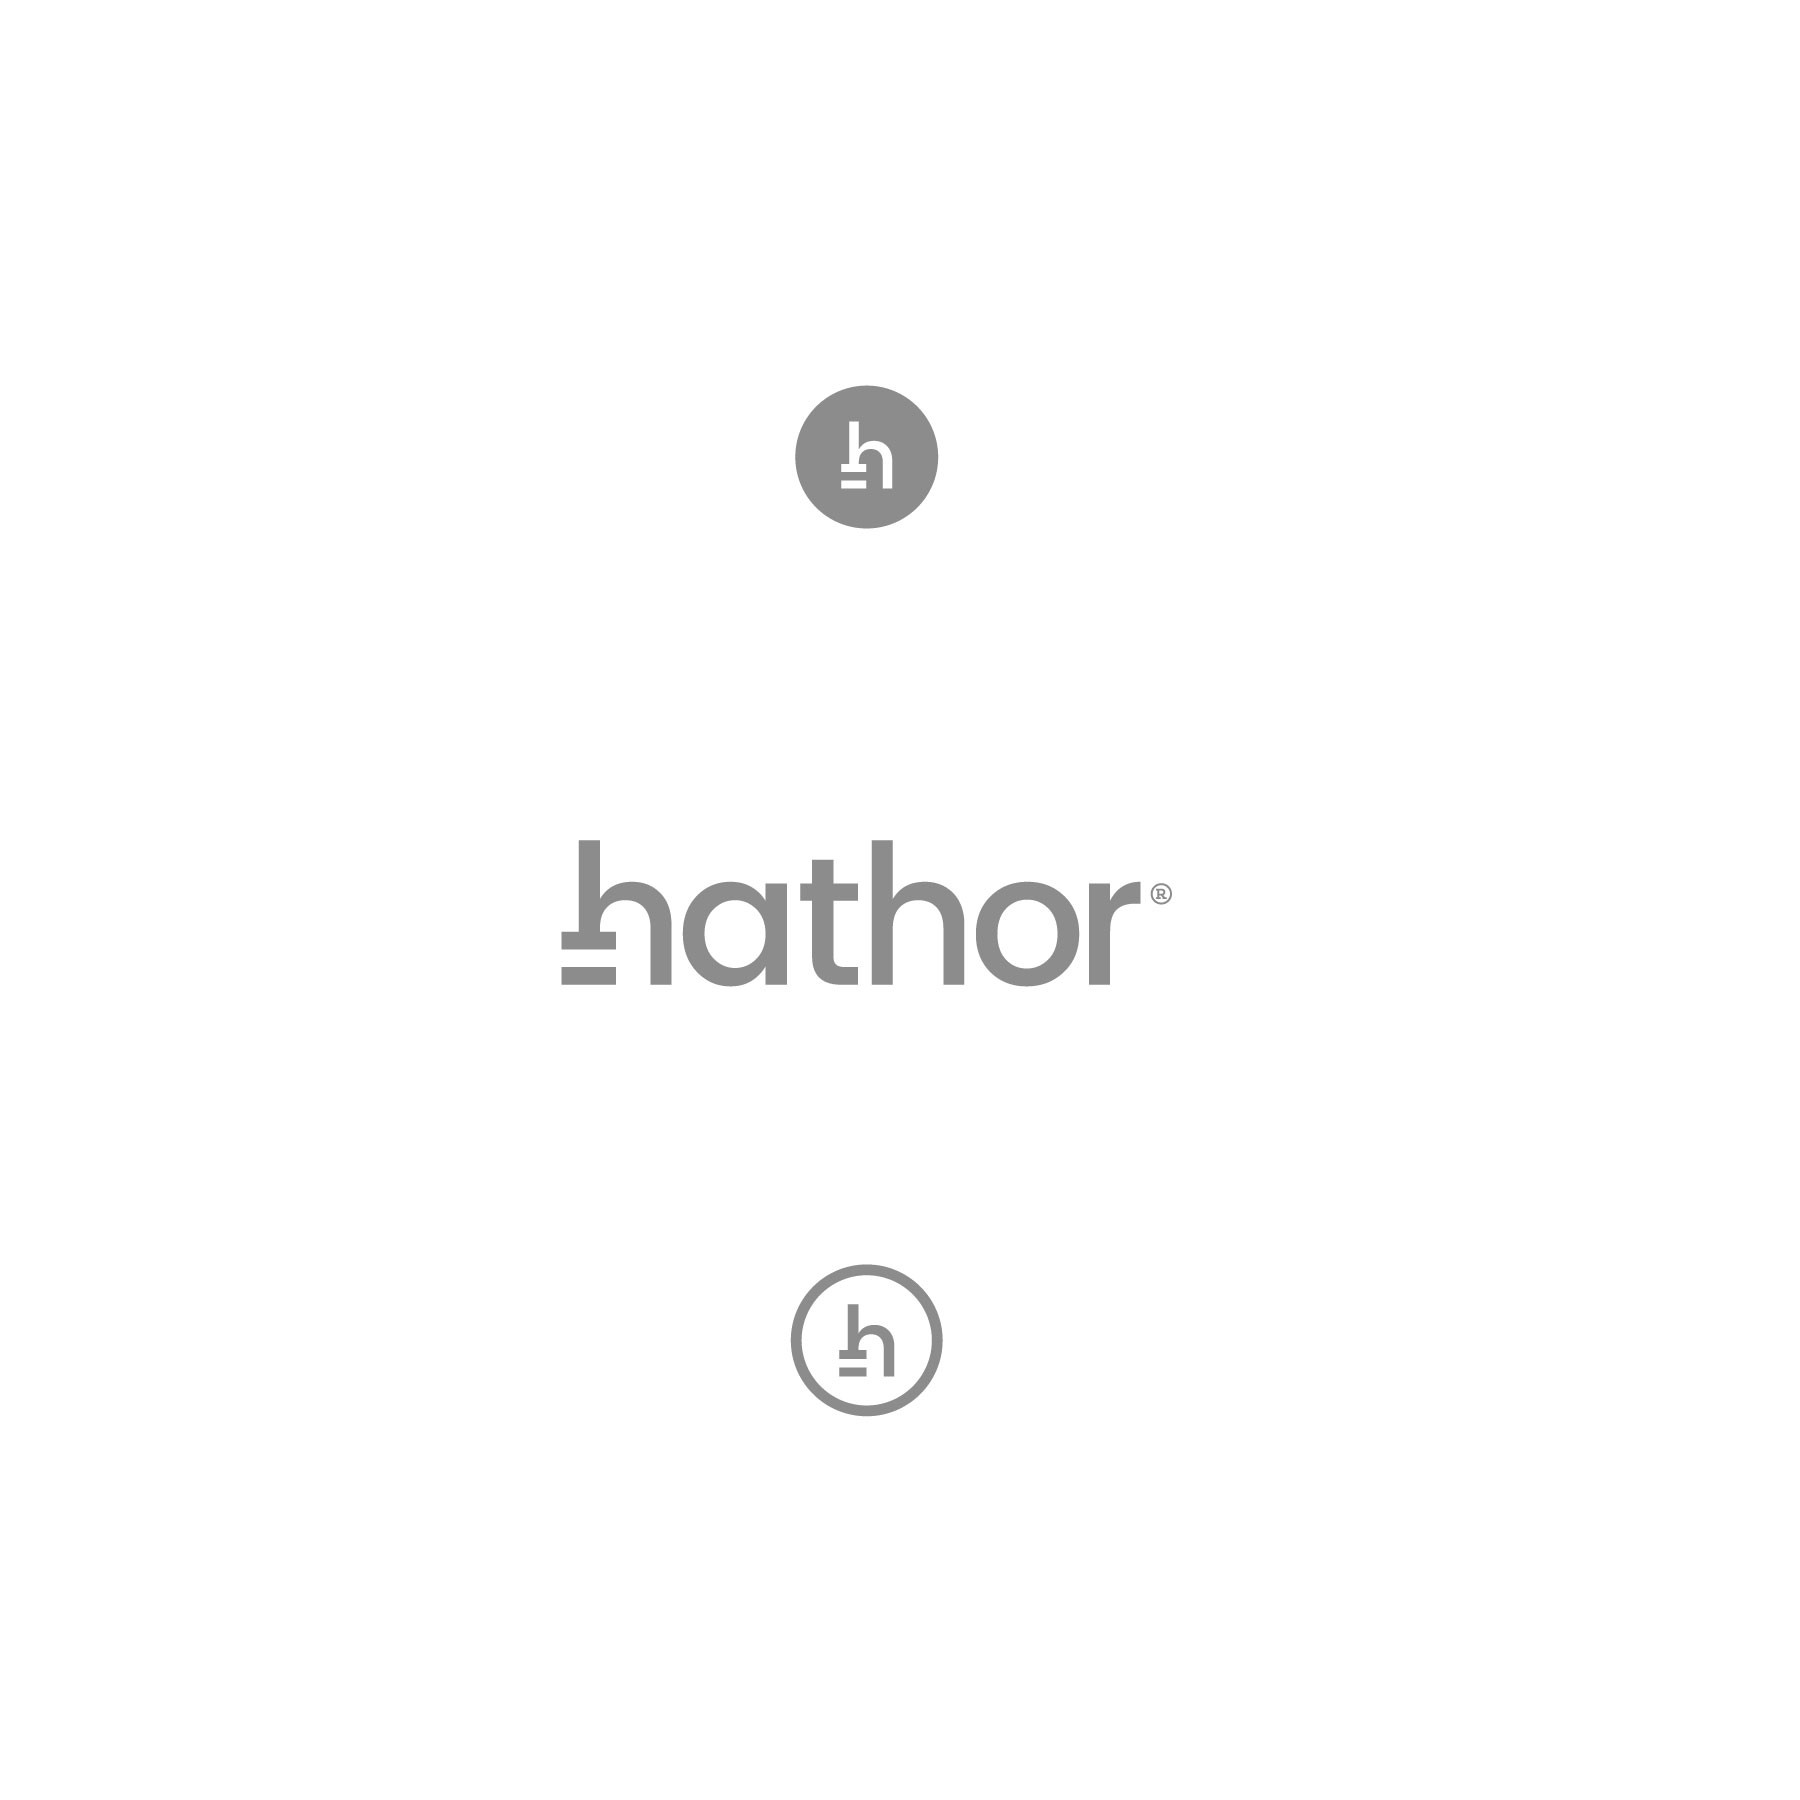 Hathor Cryptocurrency